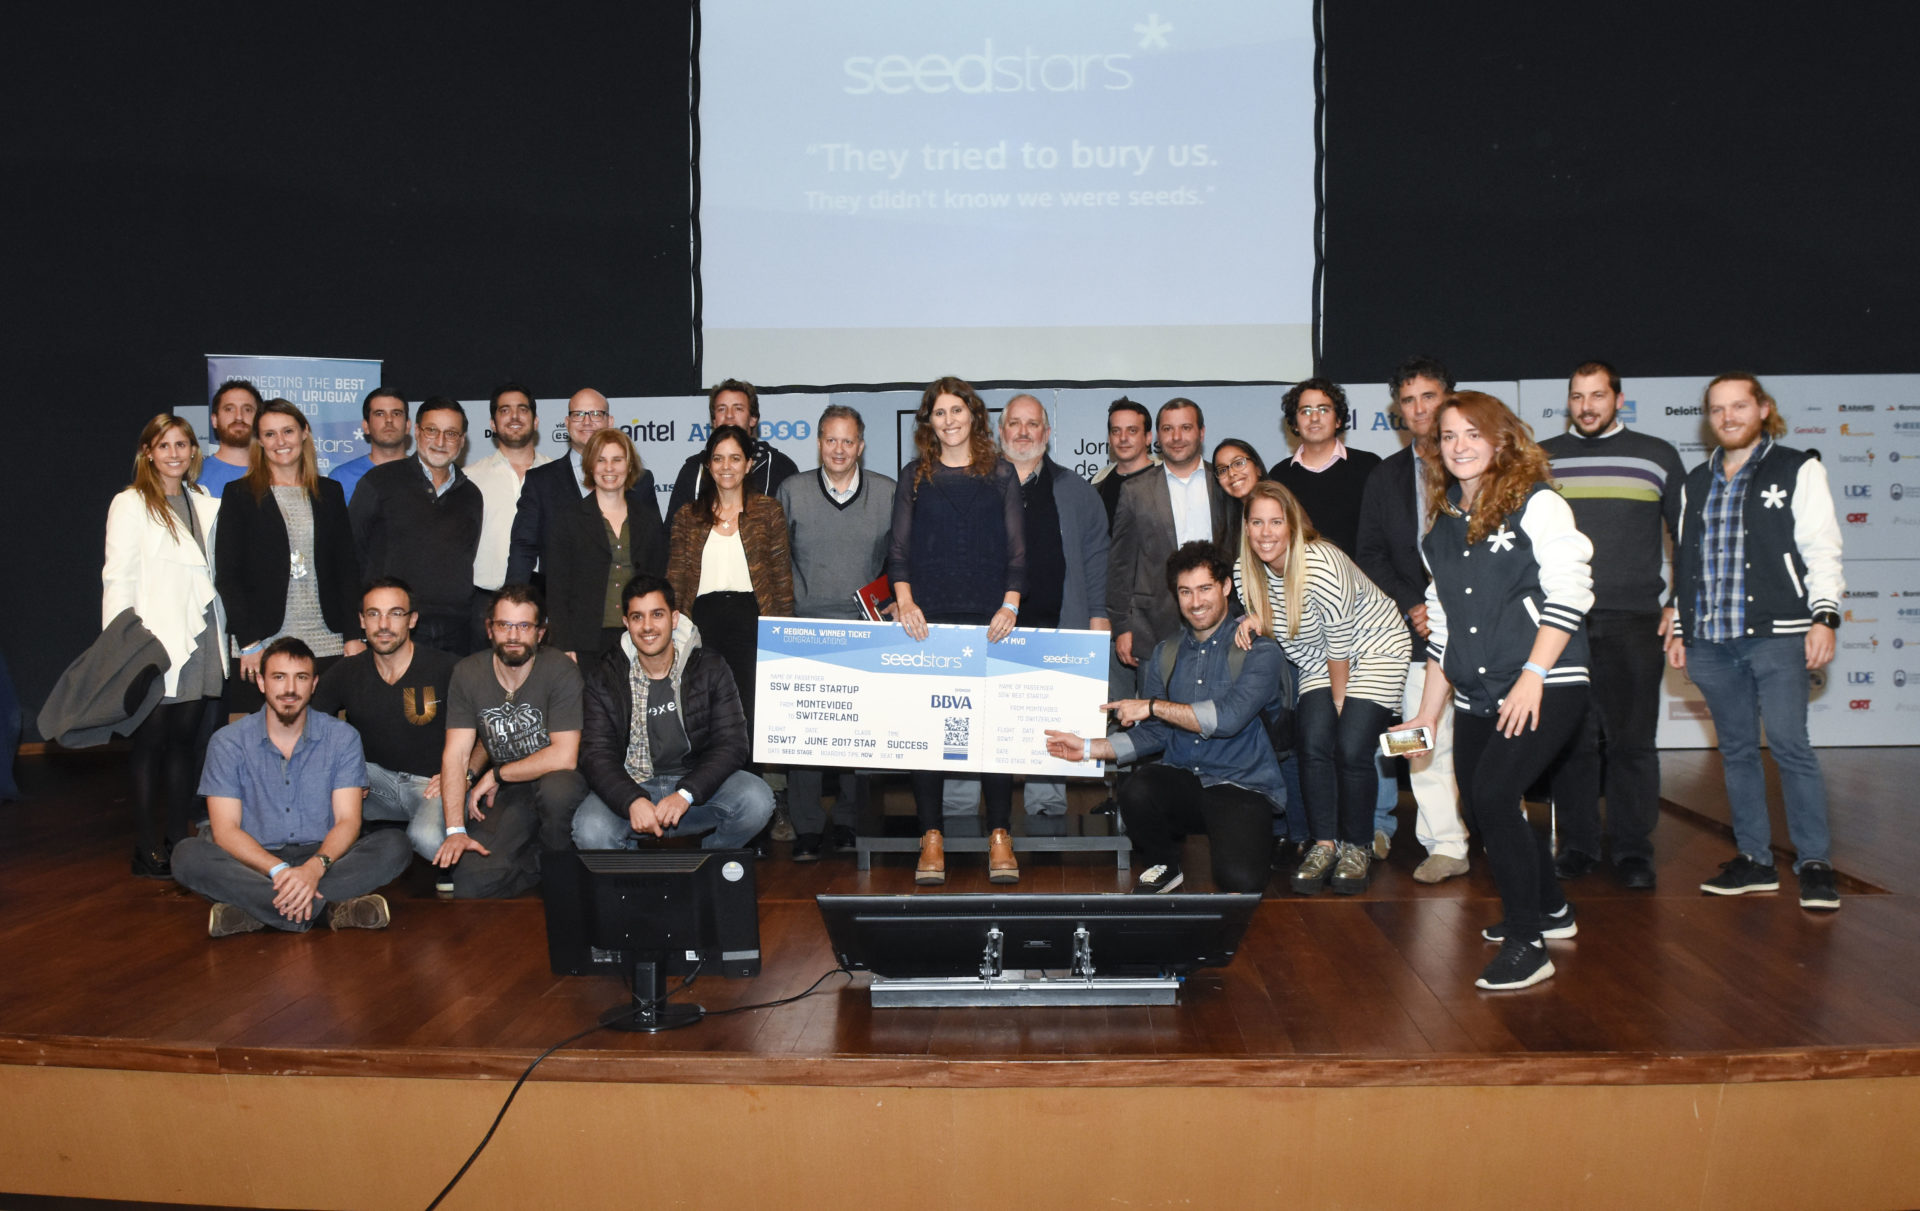 evento-uruguay-open-talent